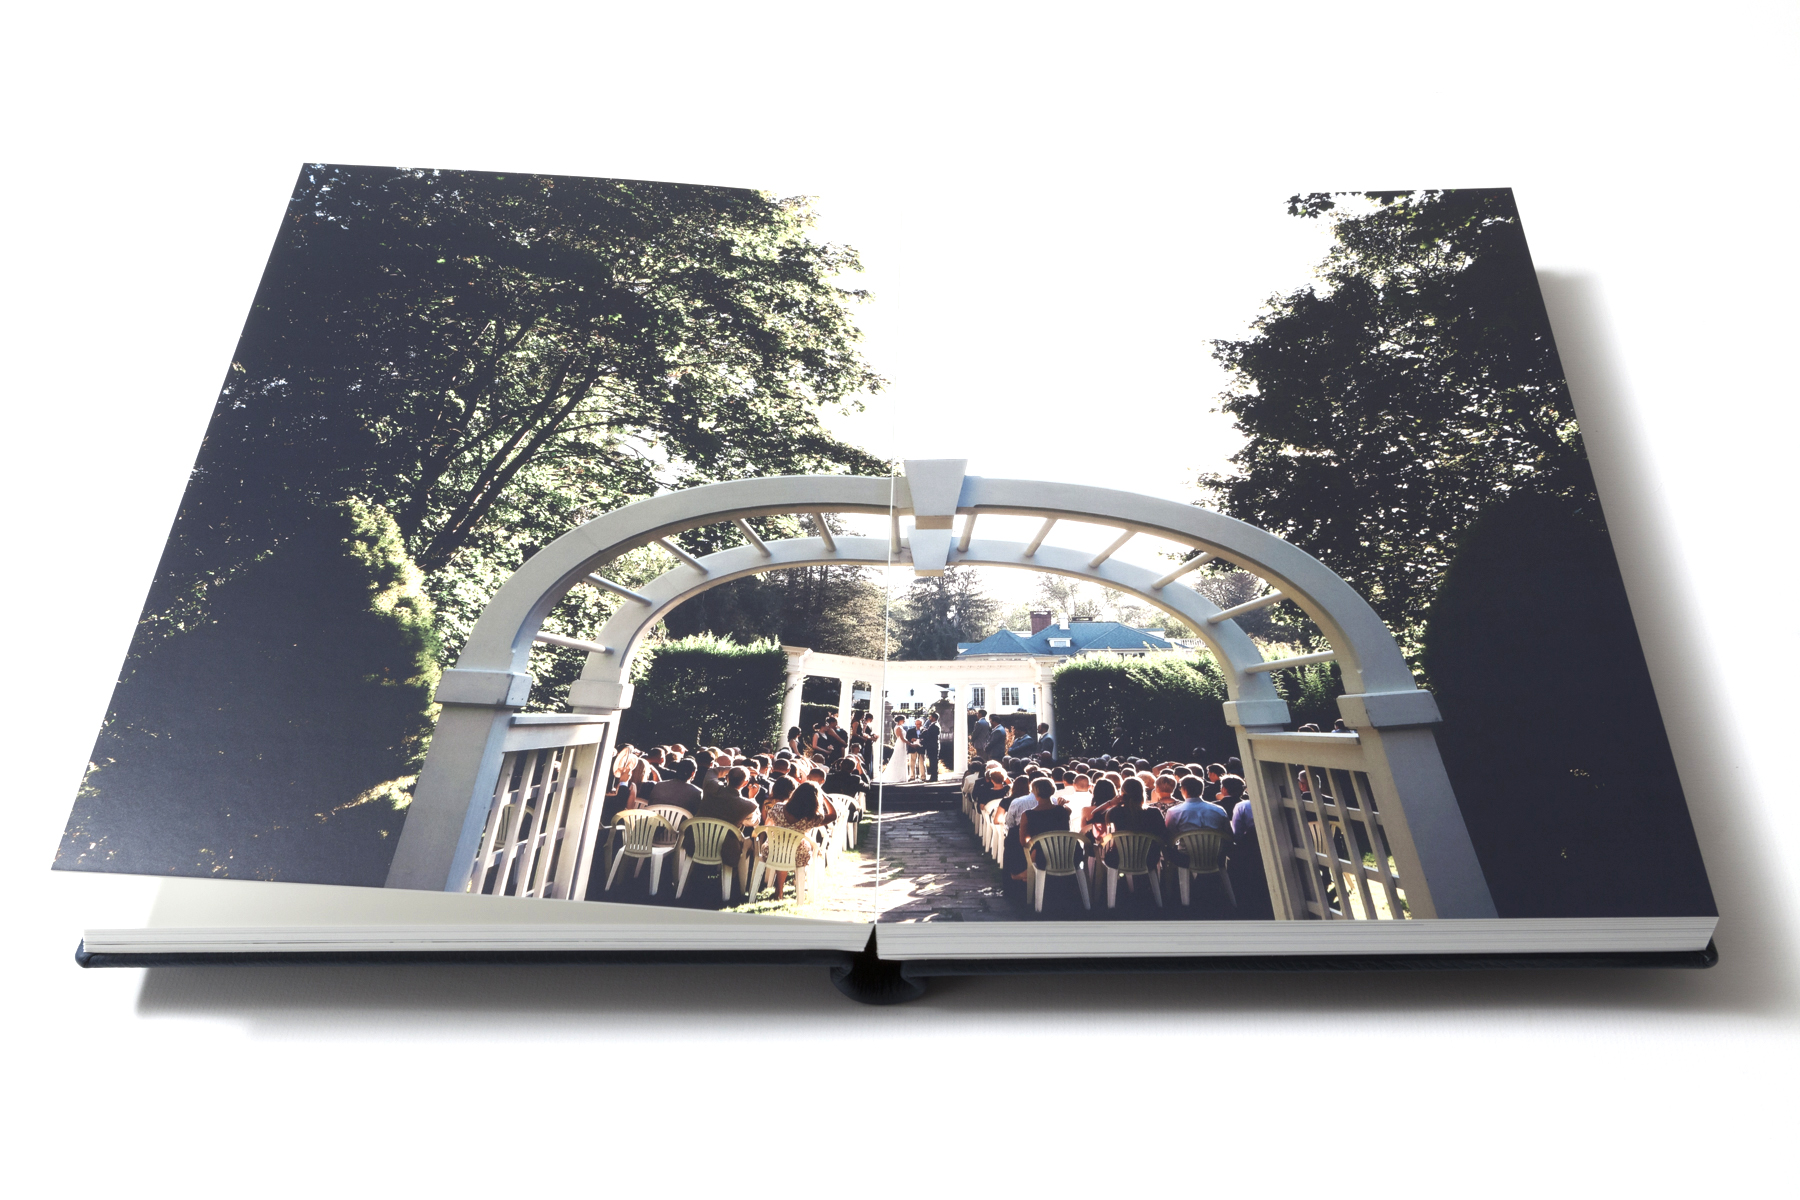 Queensberry 14x10 Q-Book